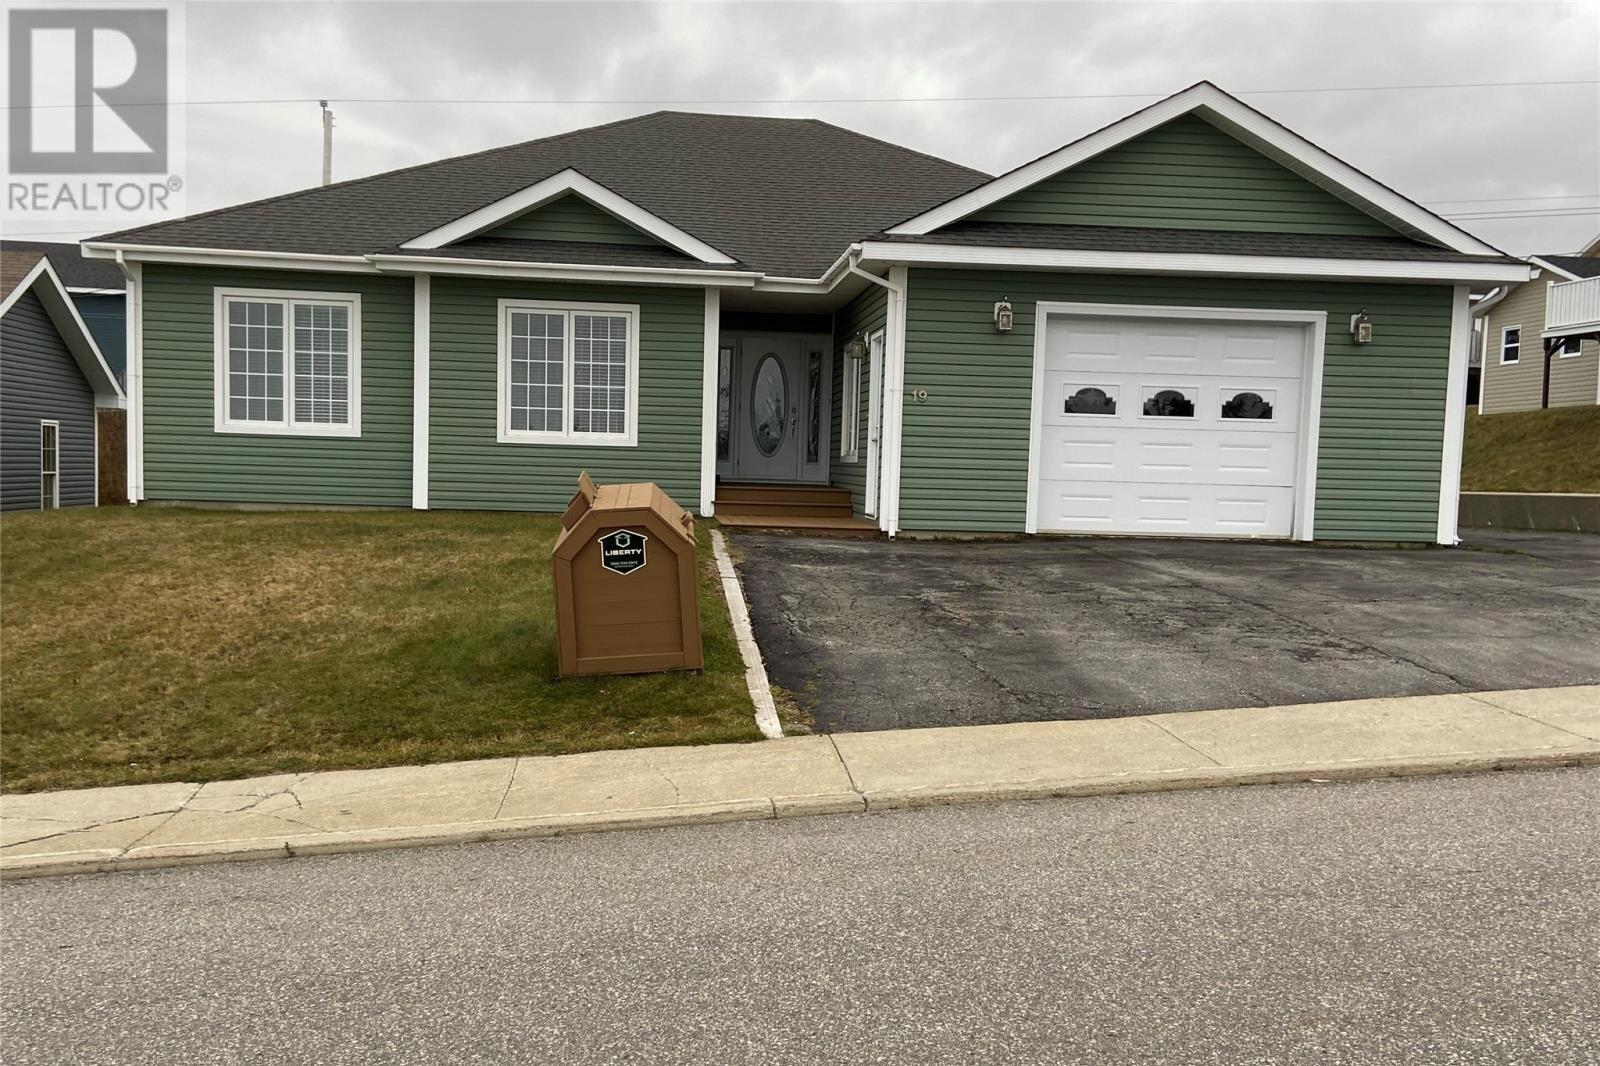 House for sale at 19 Tavernor Dr Port Aux Basques Newfoundland - MLS: 1223224